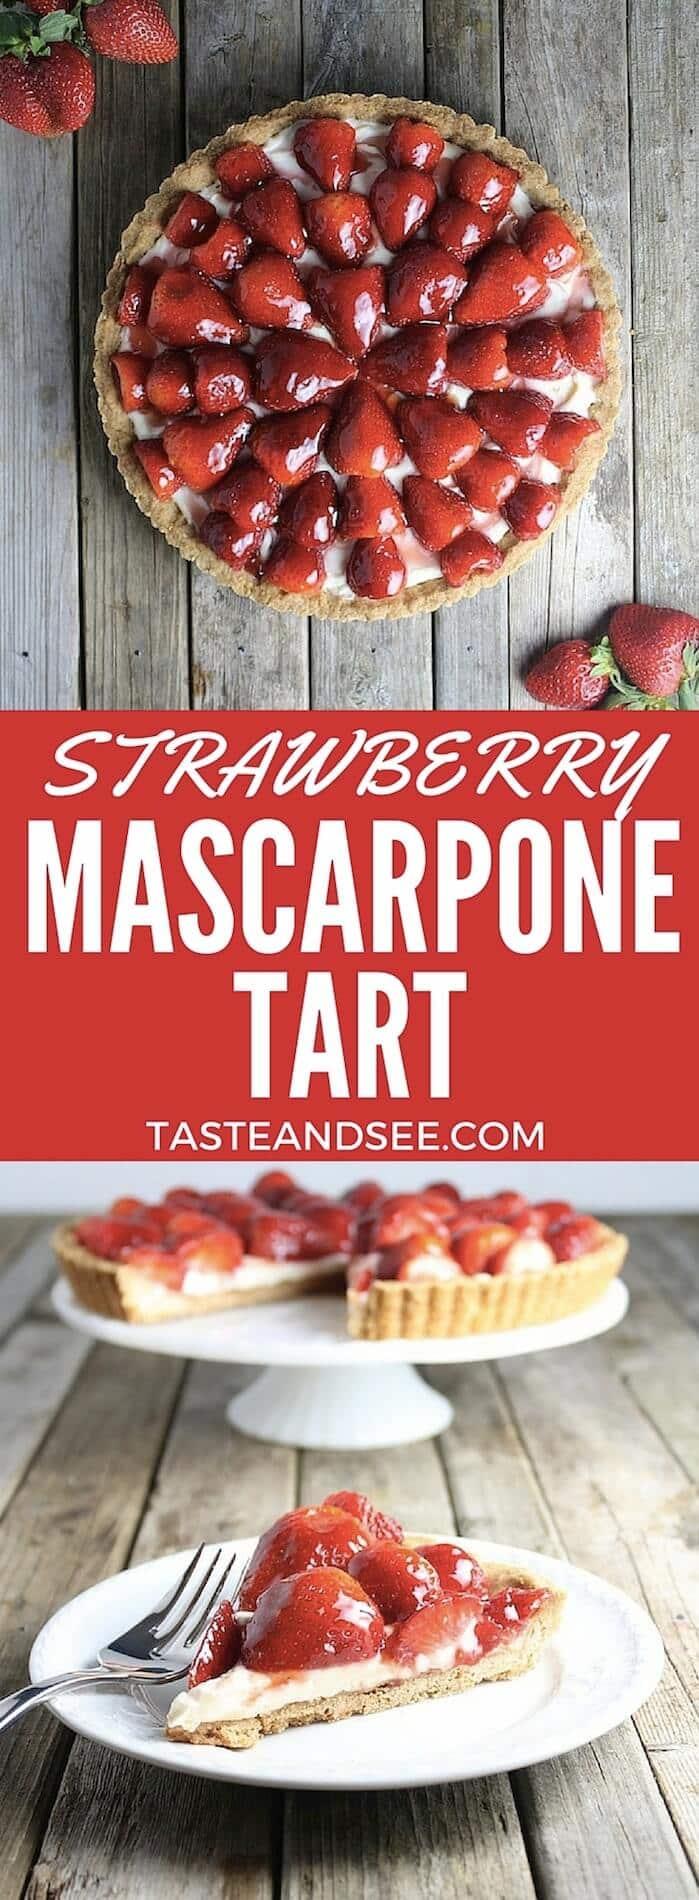 Beautiful & luscious Strawberry Mascarpone Tart. Shortbread crust w/velvety mascarpone cheese mixture, topped w/glazed strawberries. Creamy & berry sweet. https://tasteandsee.com